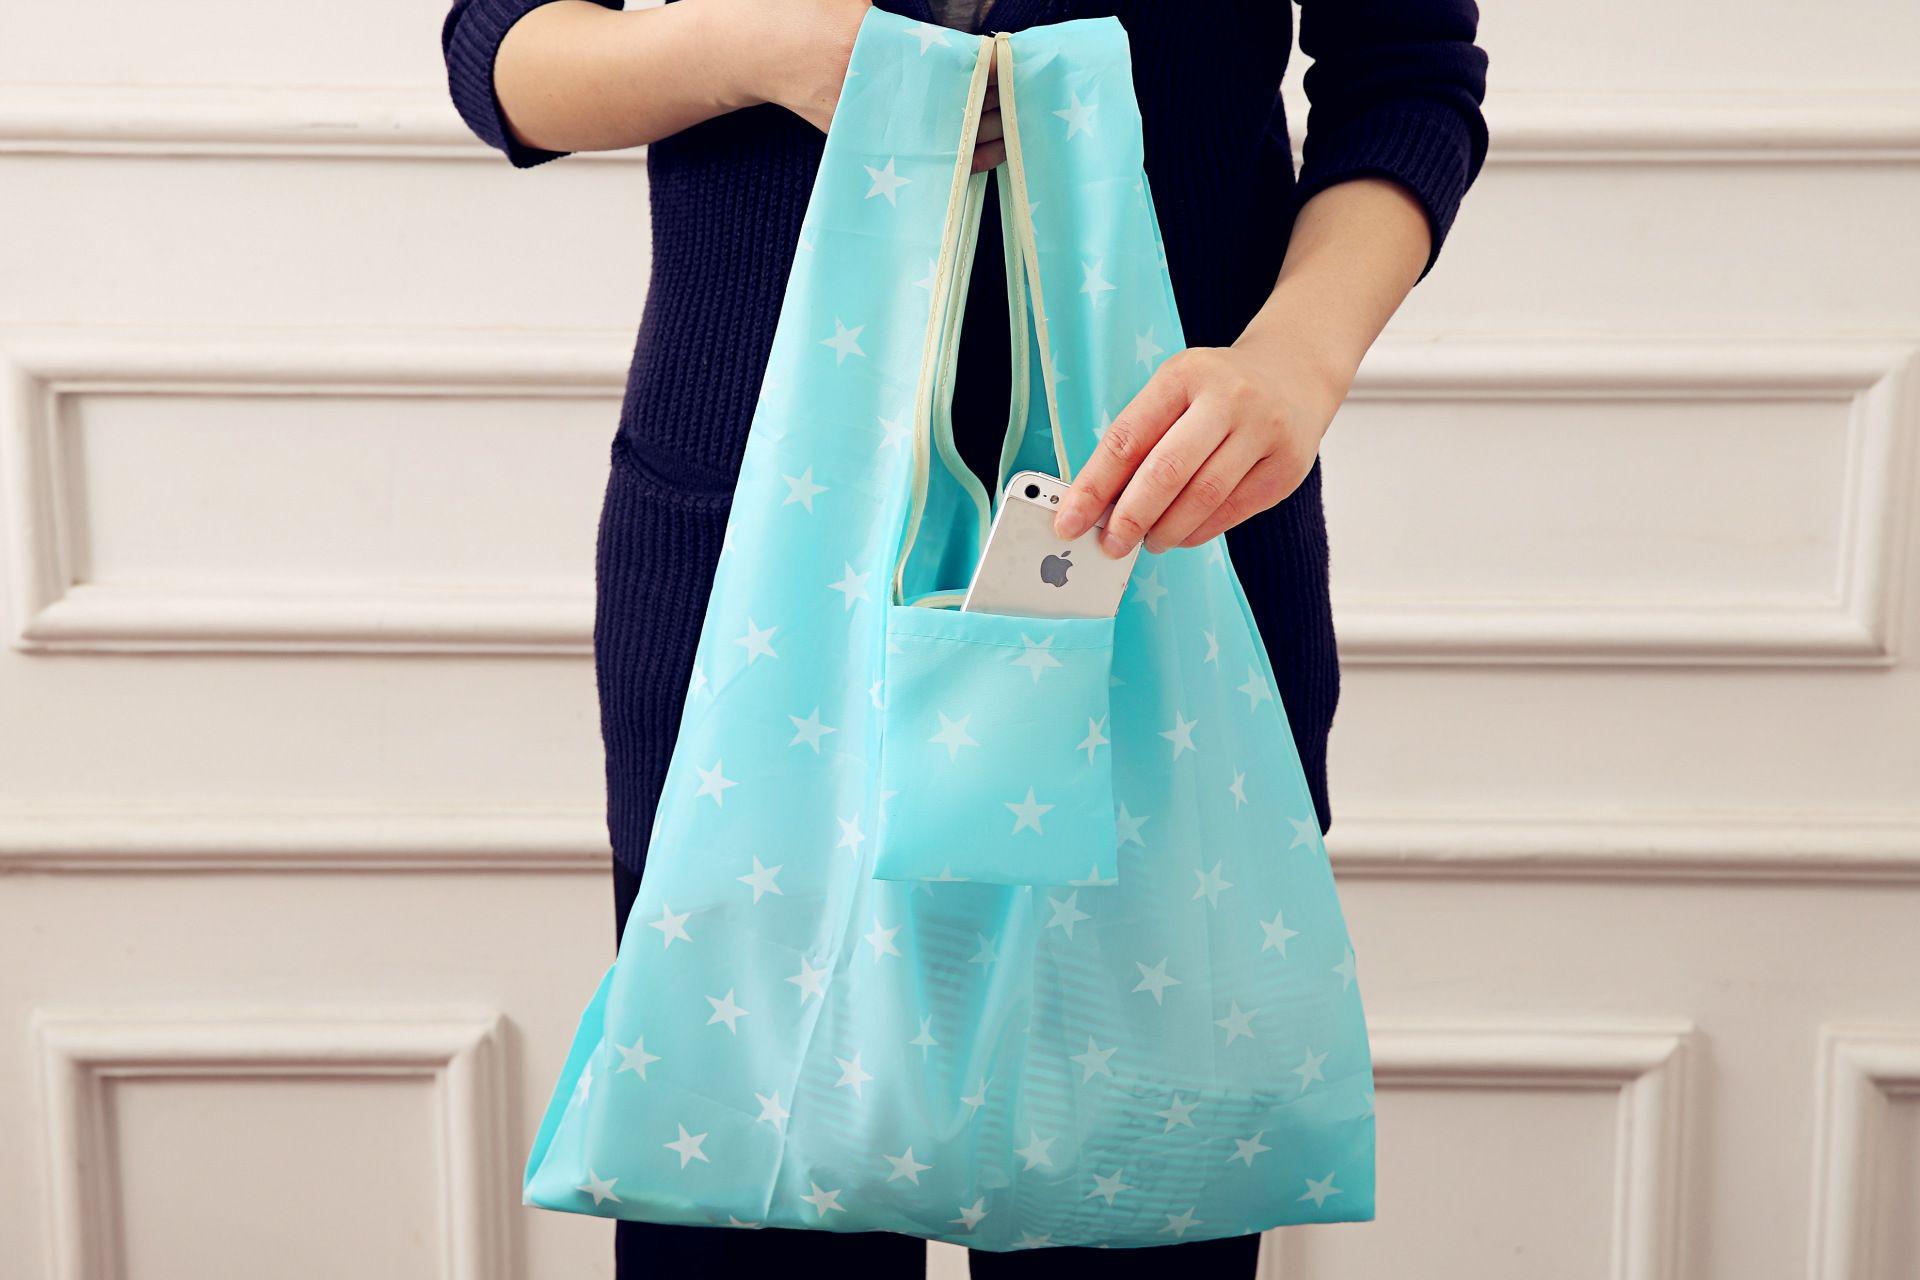 Bolsos de compras plegables de nylon Bolsa de almacenamiento de comestibles reutilizables Bolsos de compras ecológicos Bolsos de asas es W35 * H55cm HH7-1165